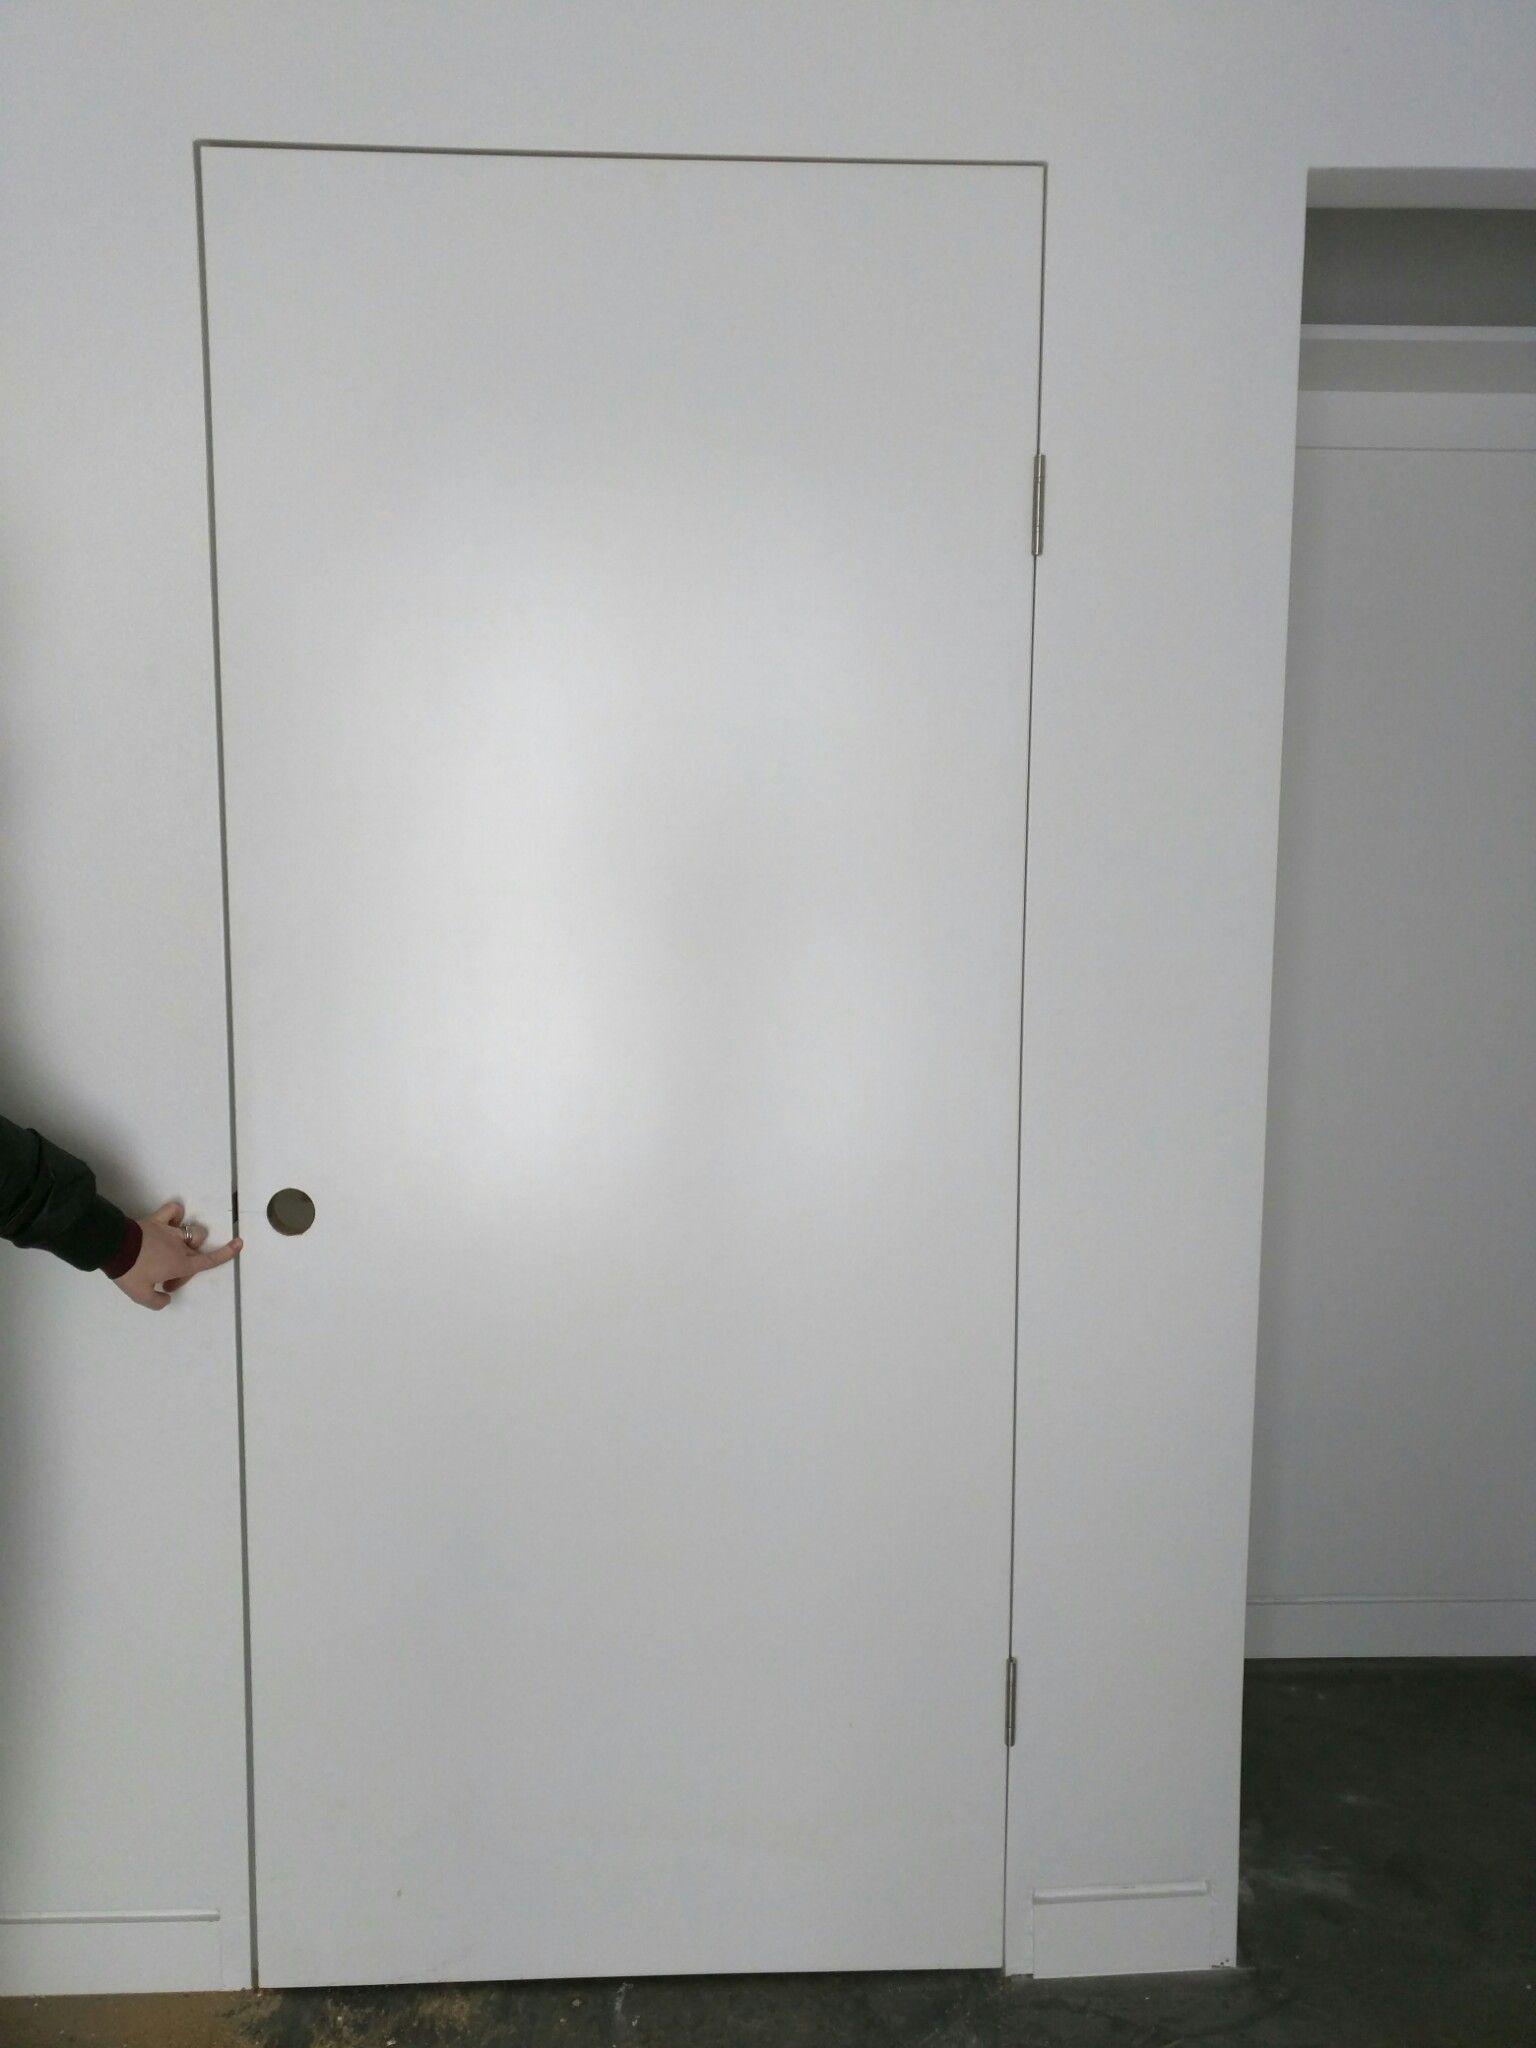 The Trimless Ezy Jamb Doors Have Been A Hot Topic On This Blog In Fact My Introduction To Ezy Jamb Ranks Number Two In Traff Modern Door Doors Interior Doors